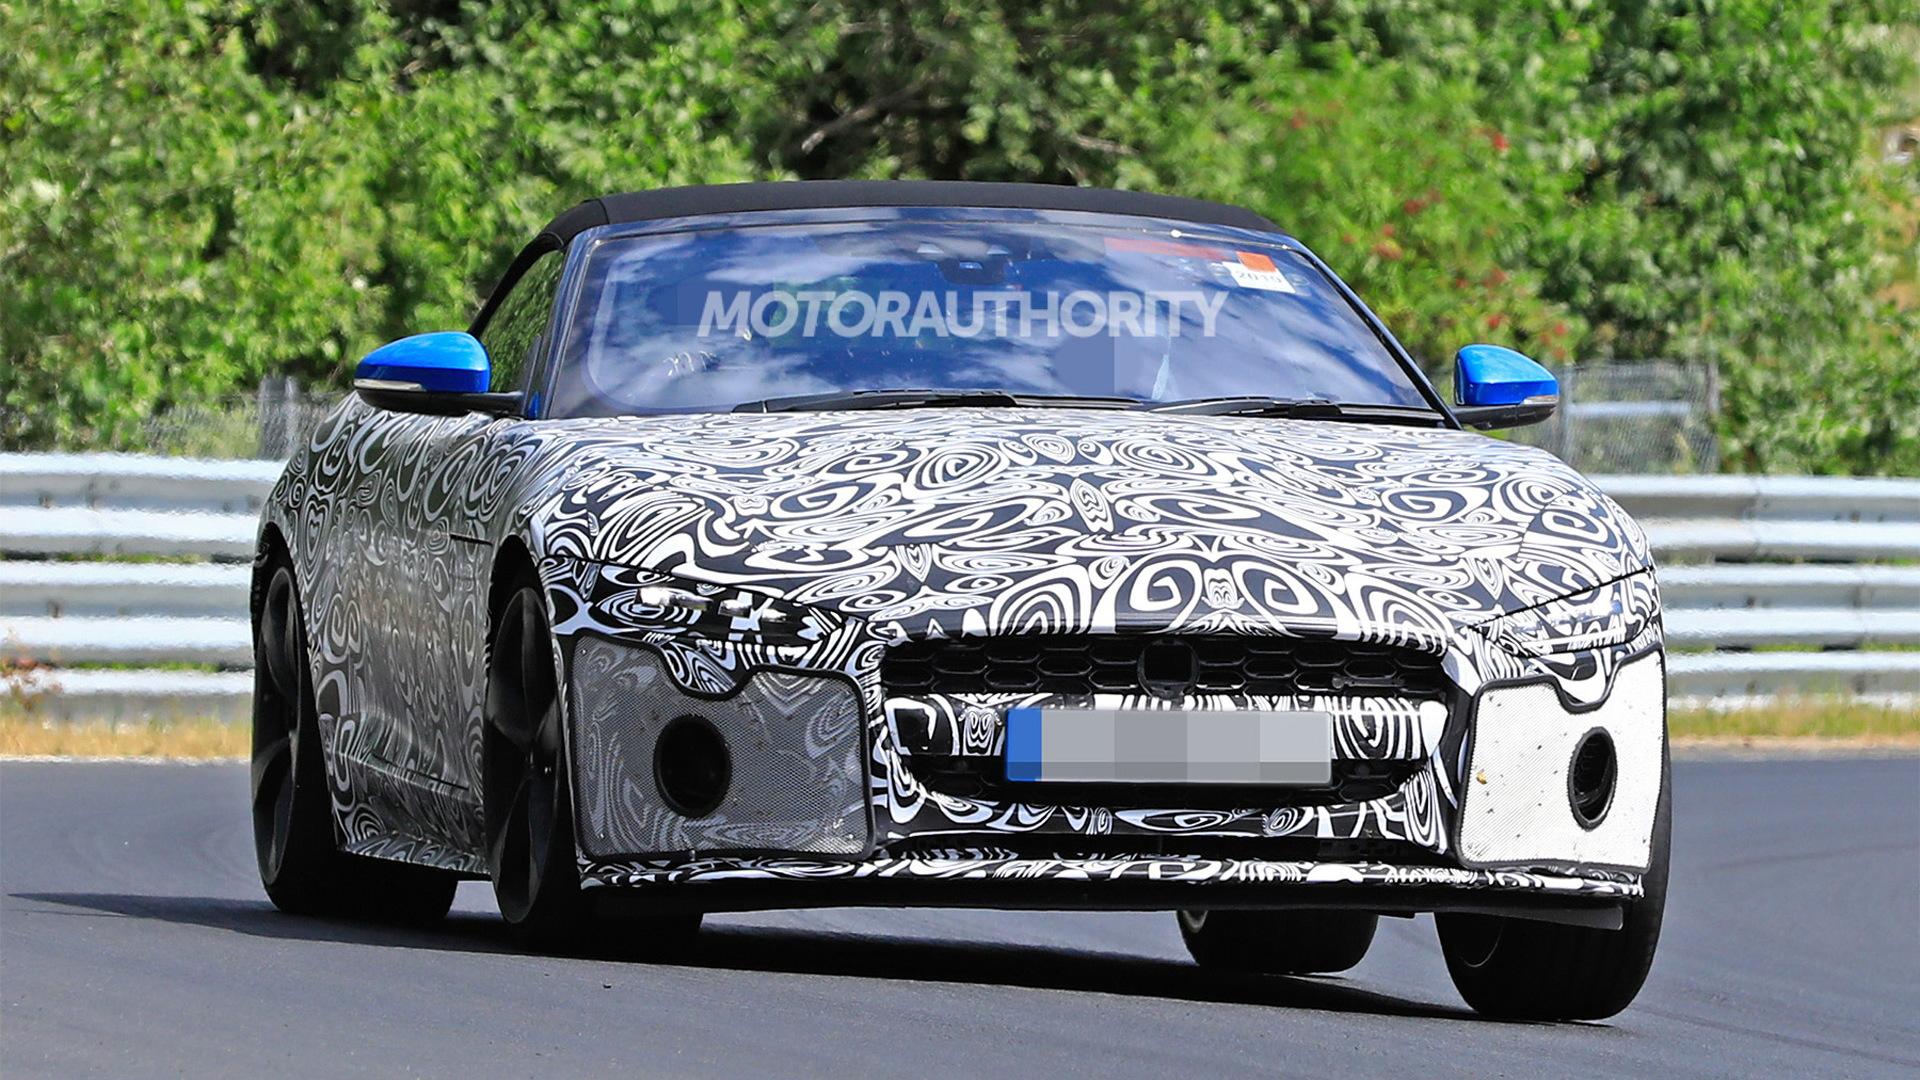 2021 Jaguar F-Type Convertible spy shots - Image via S. Baldauf/SB-Medien